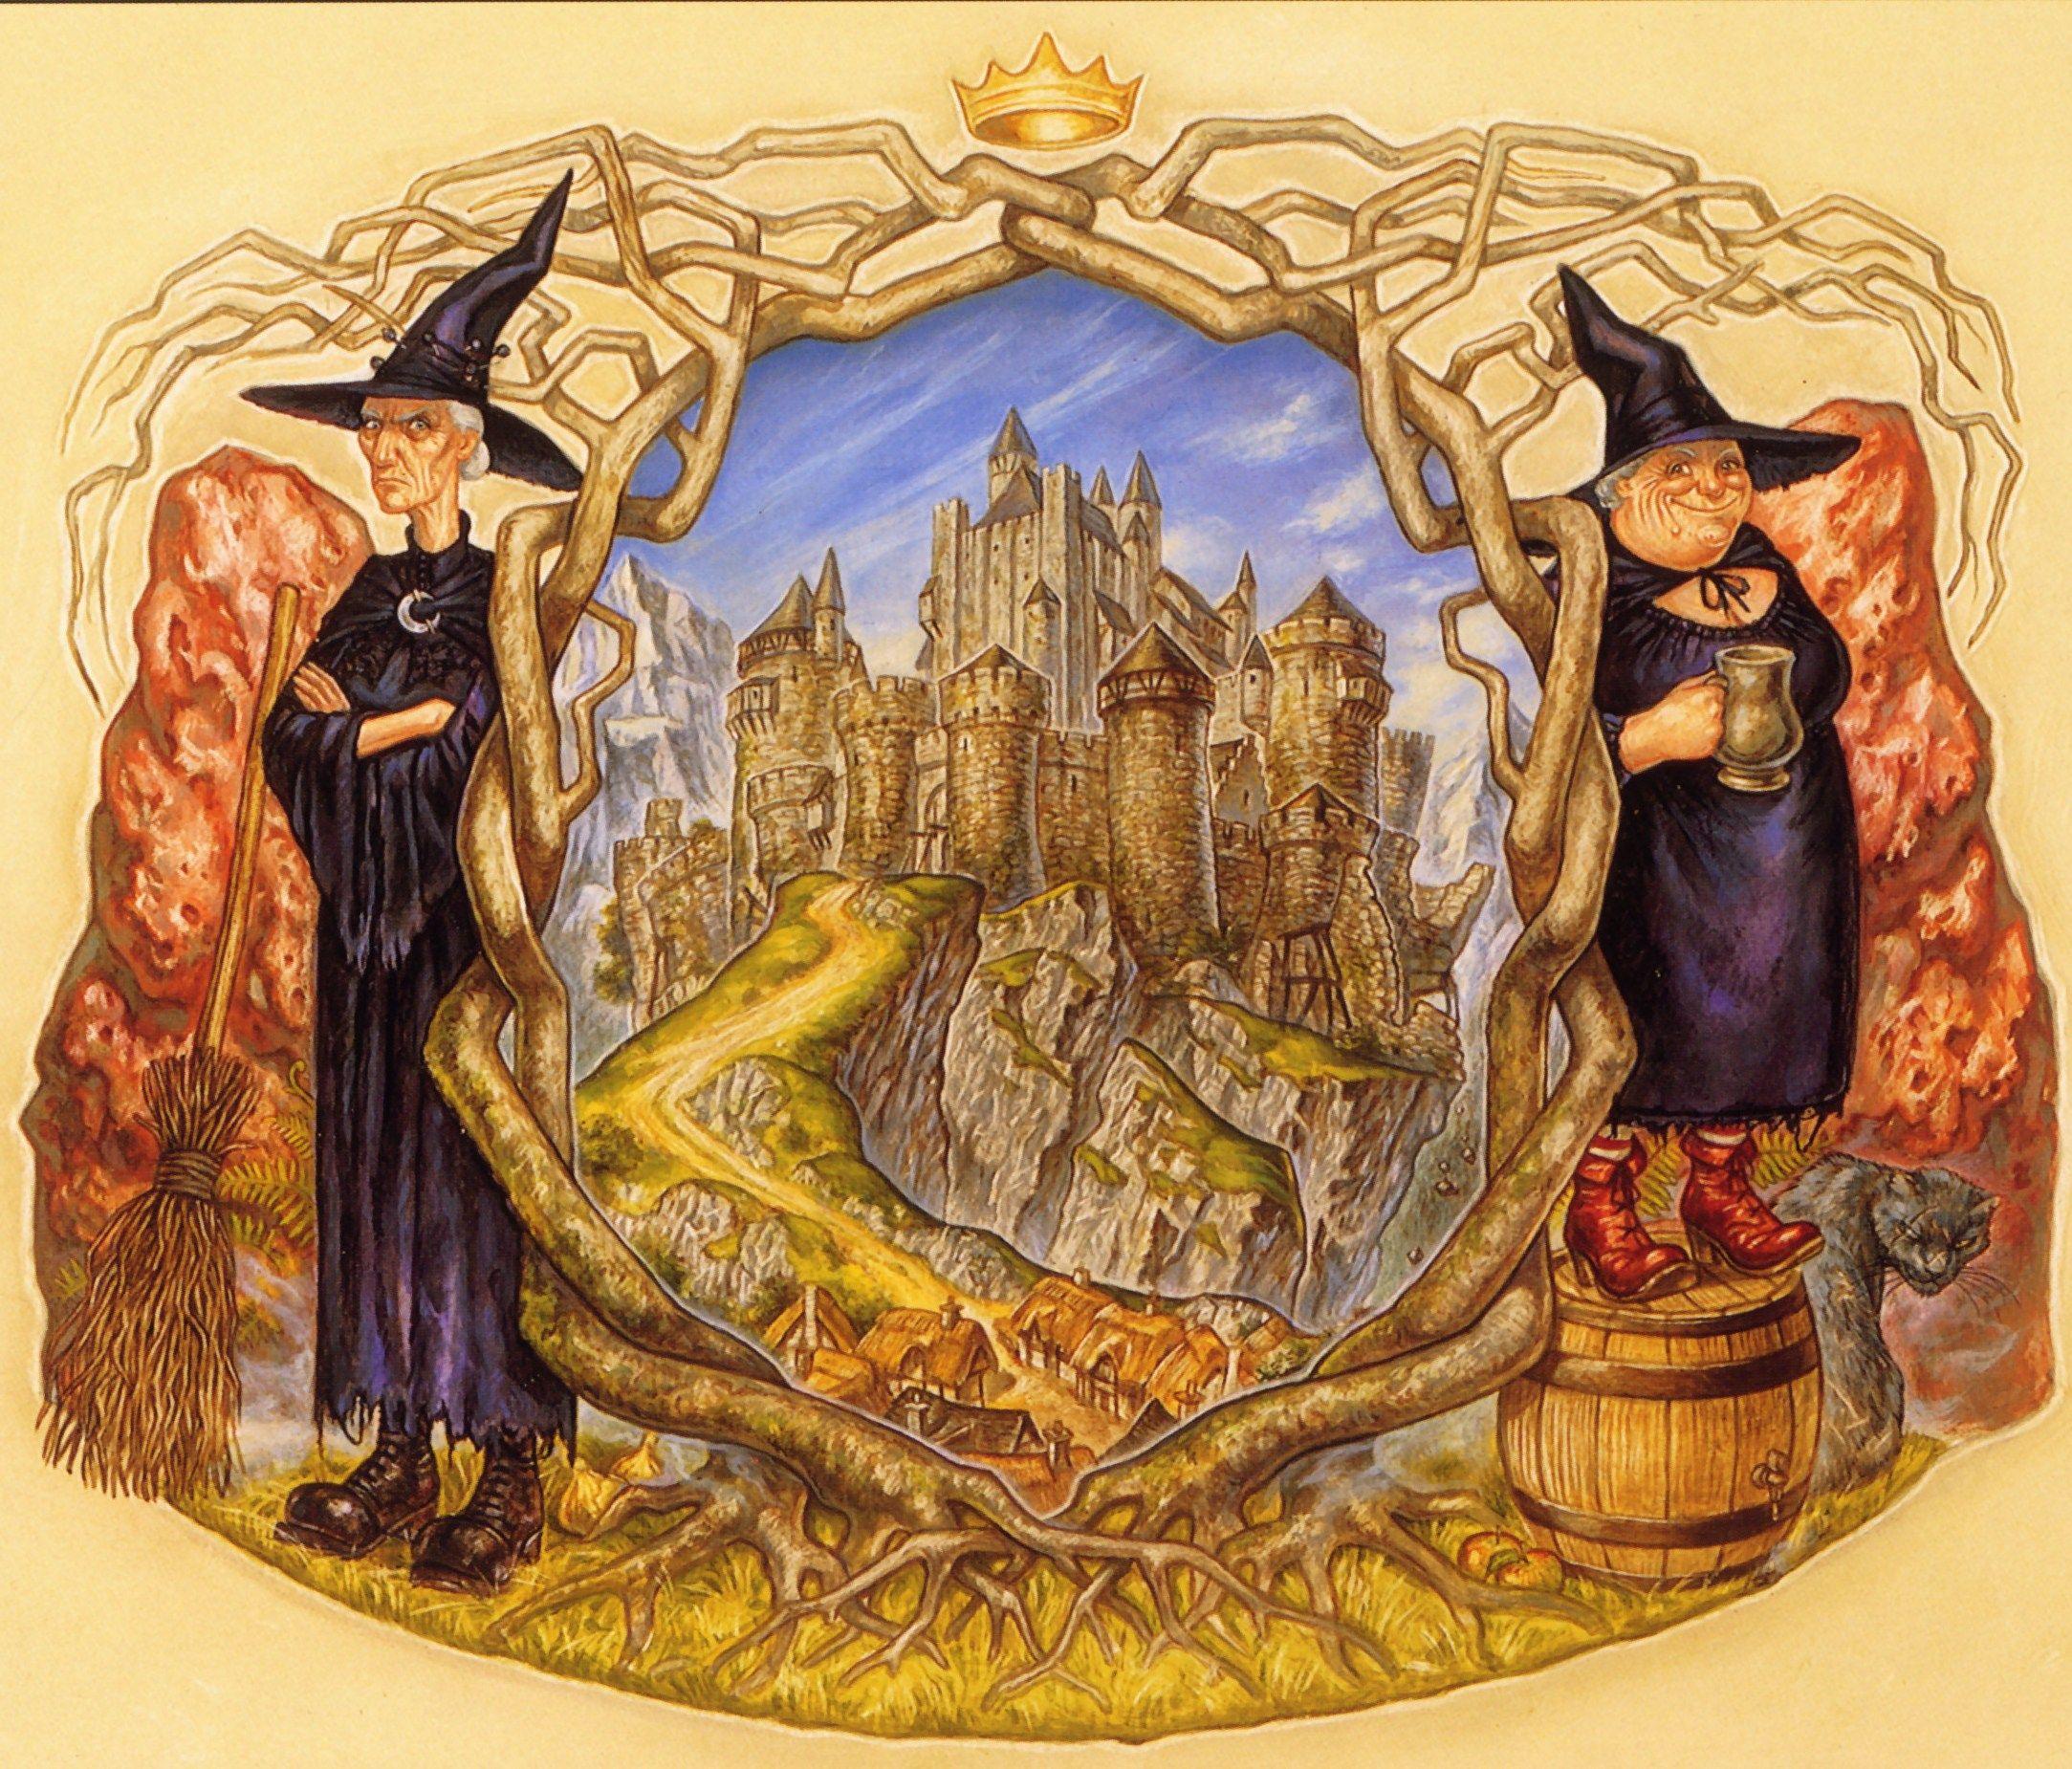 Paul Kidby Wyrd Sisters Terry Pratchett Discworld   Discworld 2167x1850